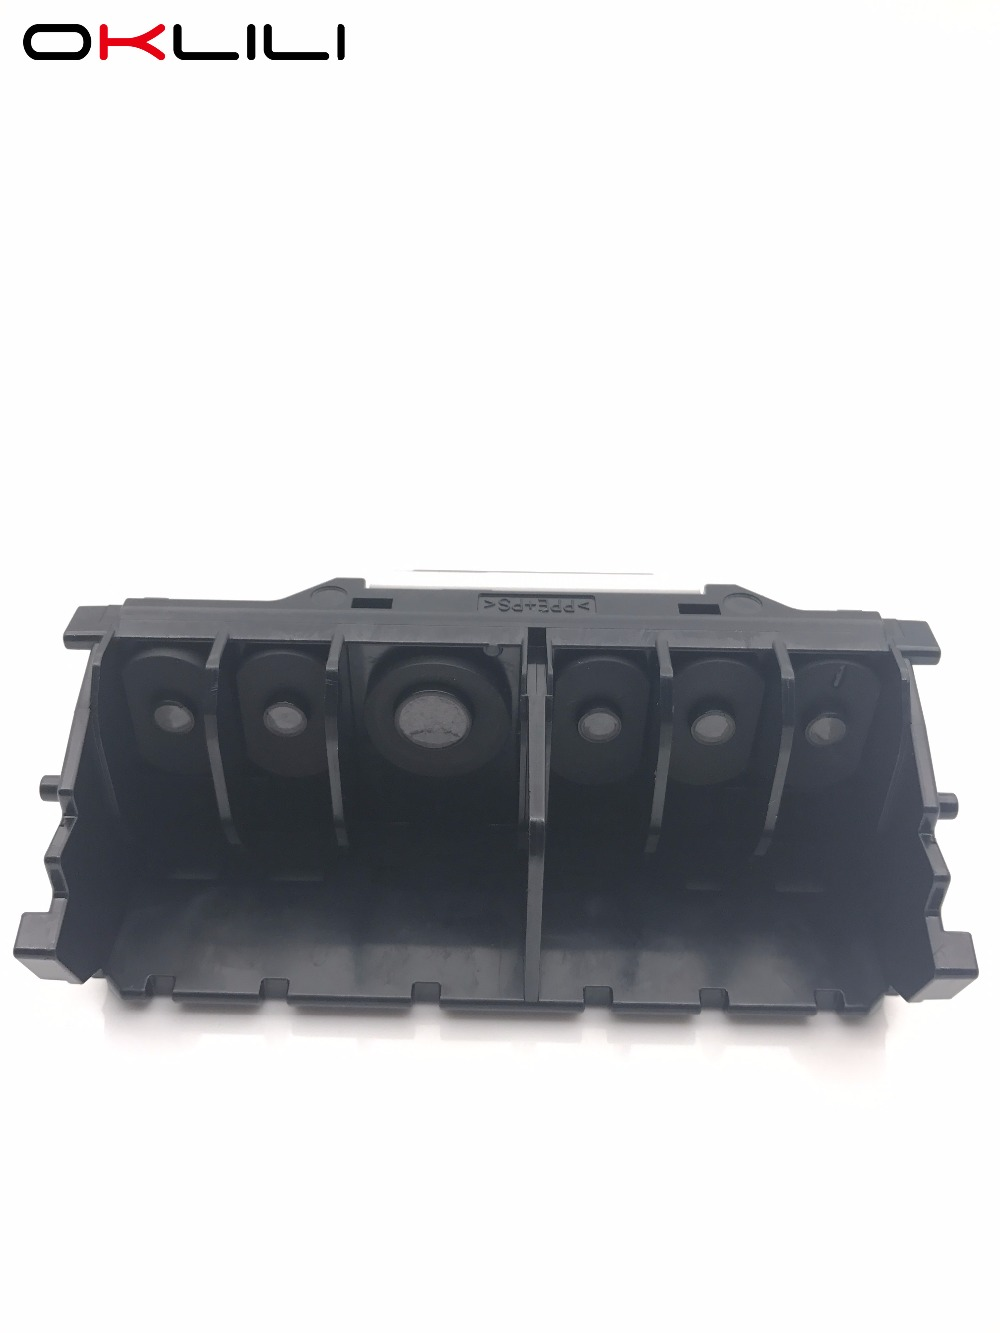 QY6-0083 Druckkopf Druckkopf für Canon MG6310 MG6320 MG6350 MG6380 MG7120 MG7150 MG7180 iP8720 iP8750 iP8780 7110 MG7520 MG7550